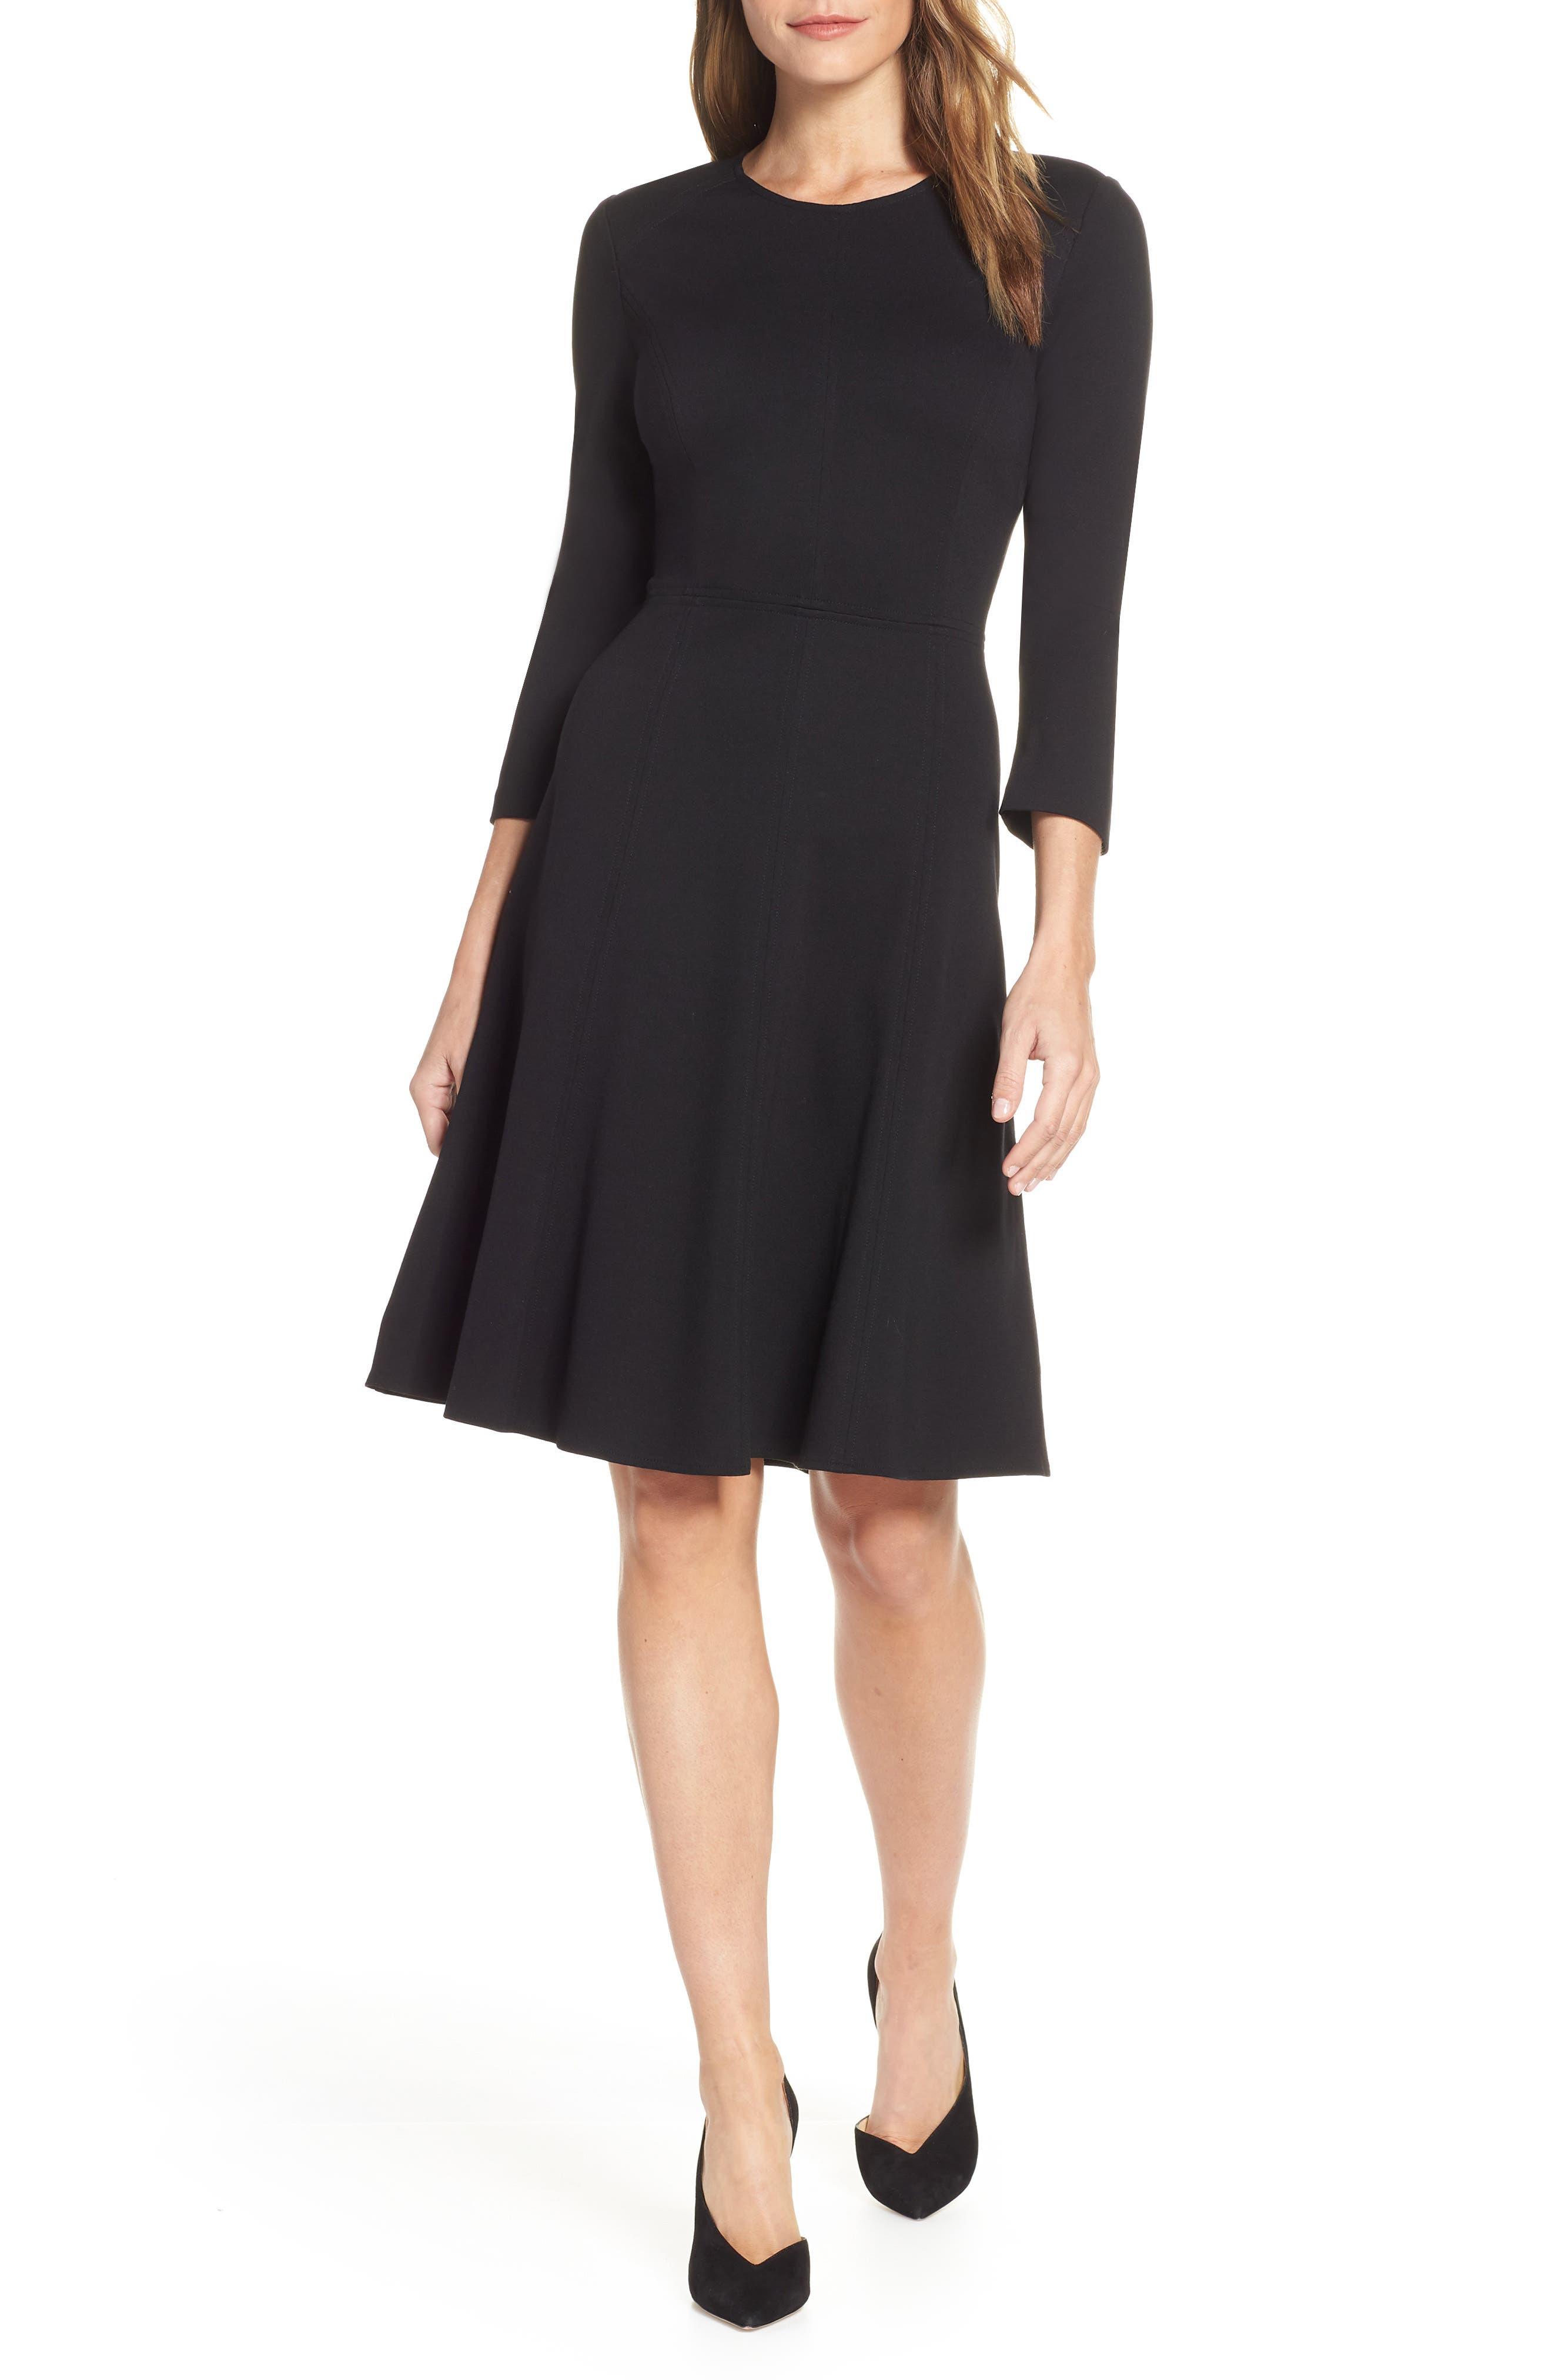 ELIZA J, Seamed Fit & Flare Dress, Main thumbnail 1, color, BLACK